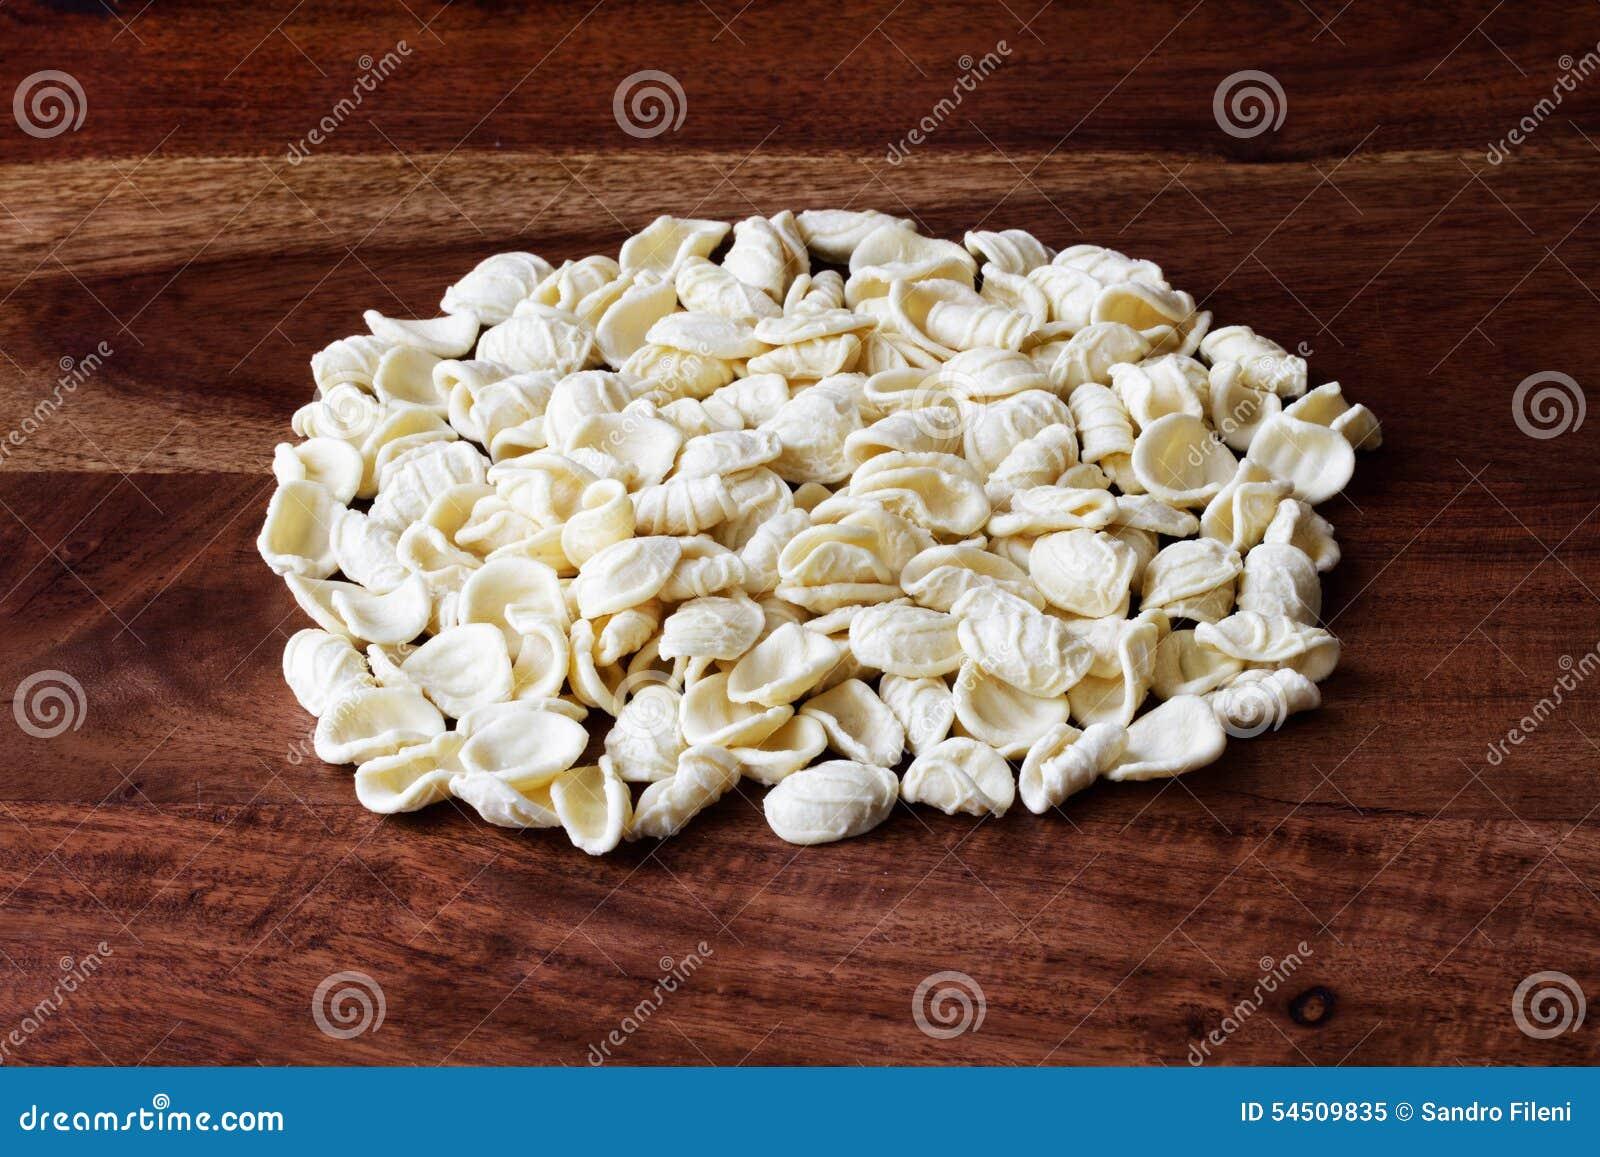 Italian Food Homemade Pasta Orecchiette Stock Image Image Of